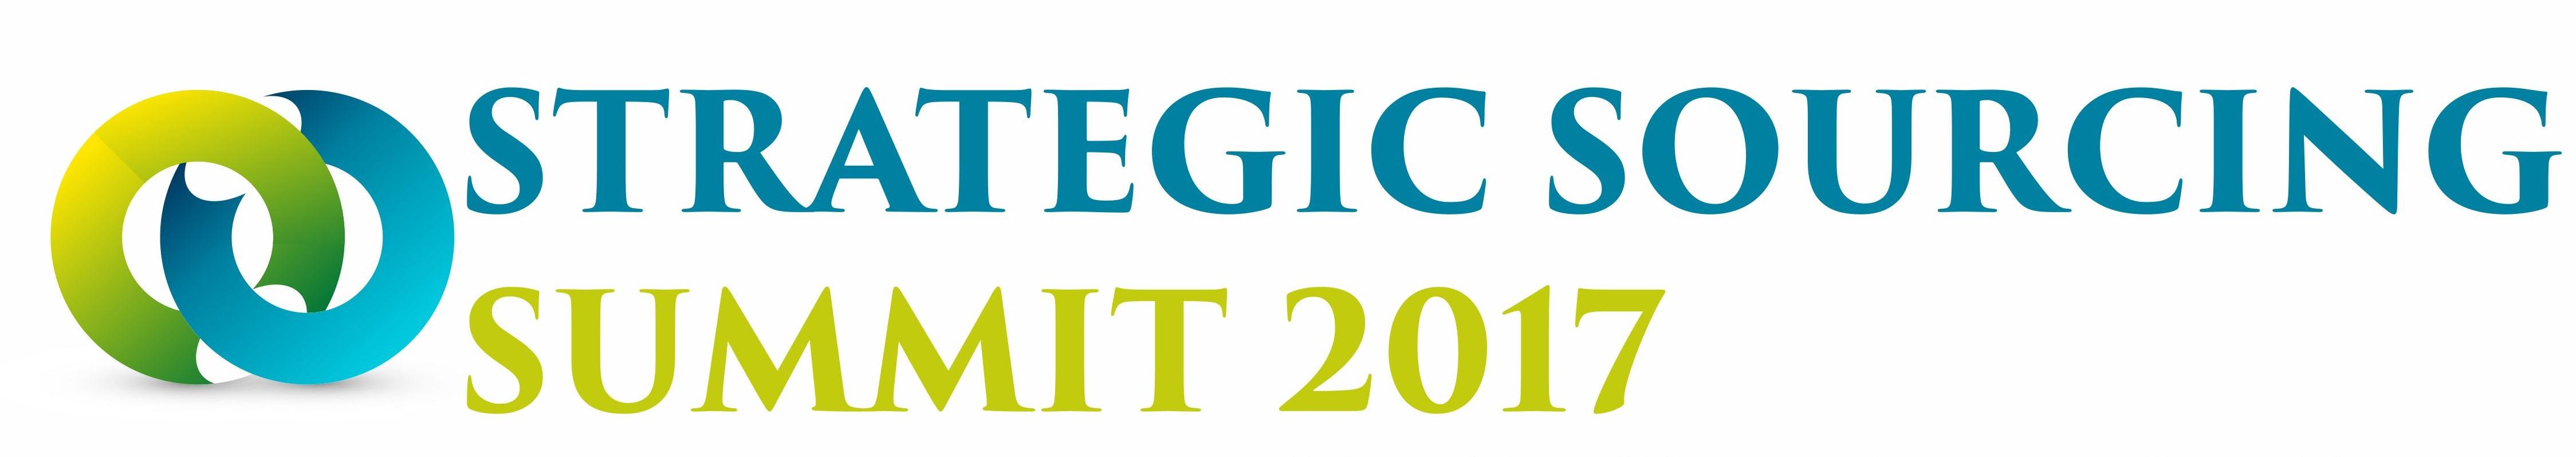 cx strategy summit 2017